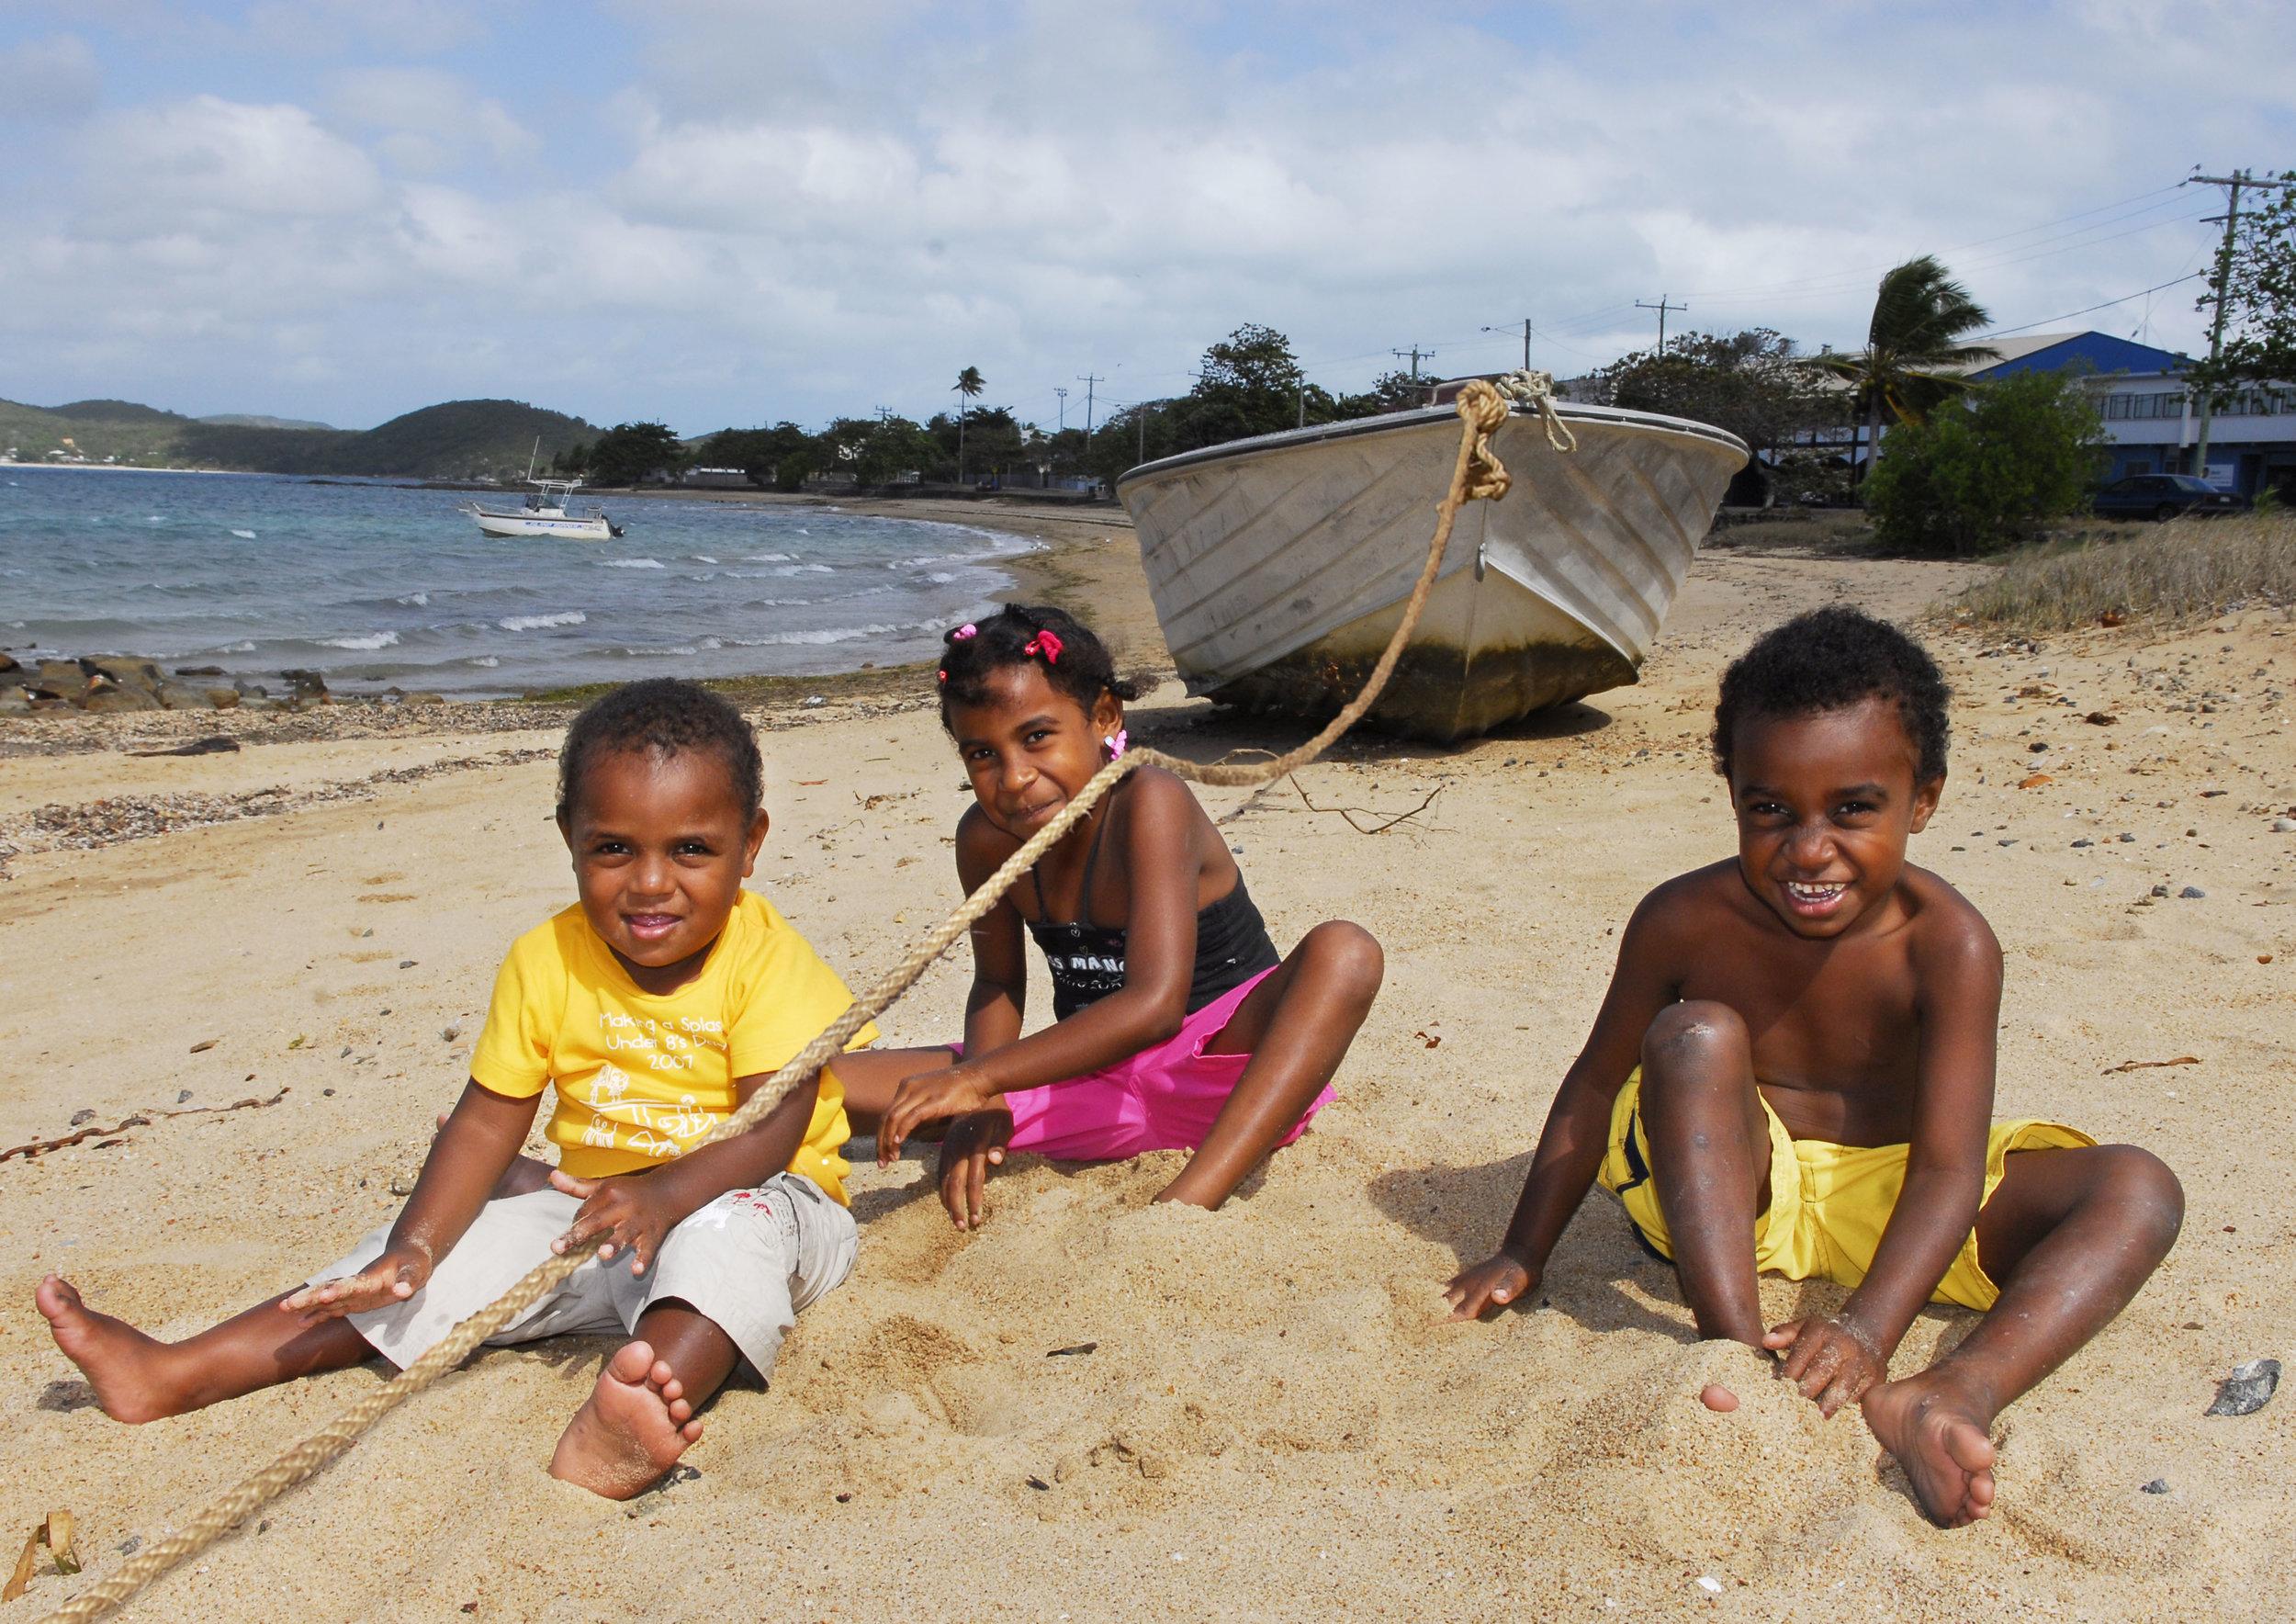 Torres Strait Islander kids singing the song 1,2,3,4,5 Islander culture